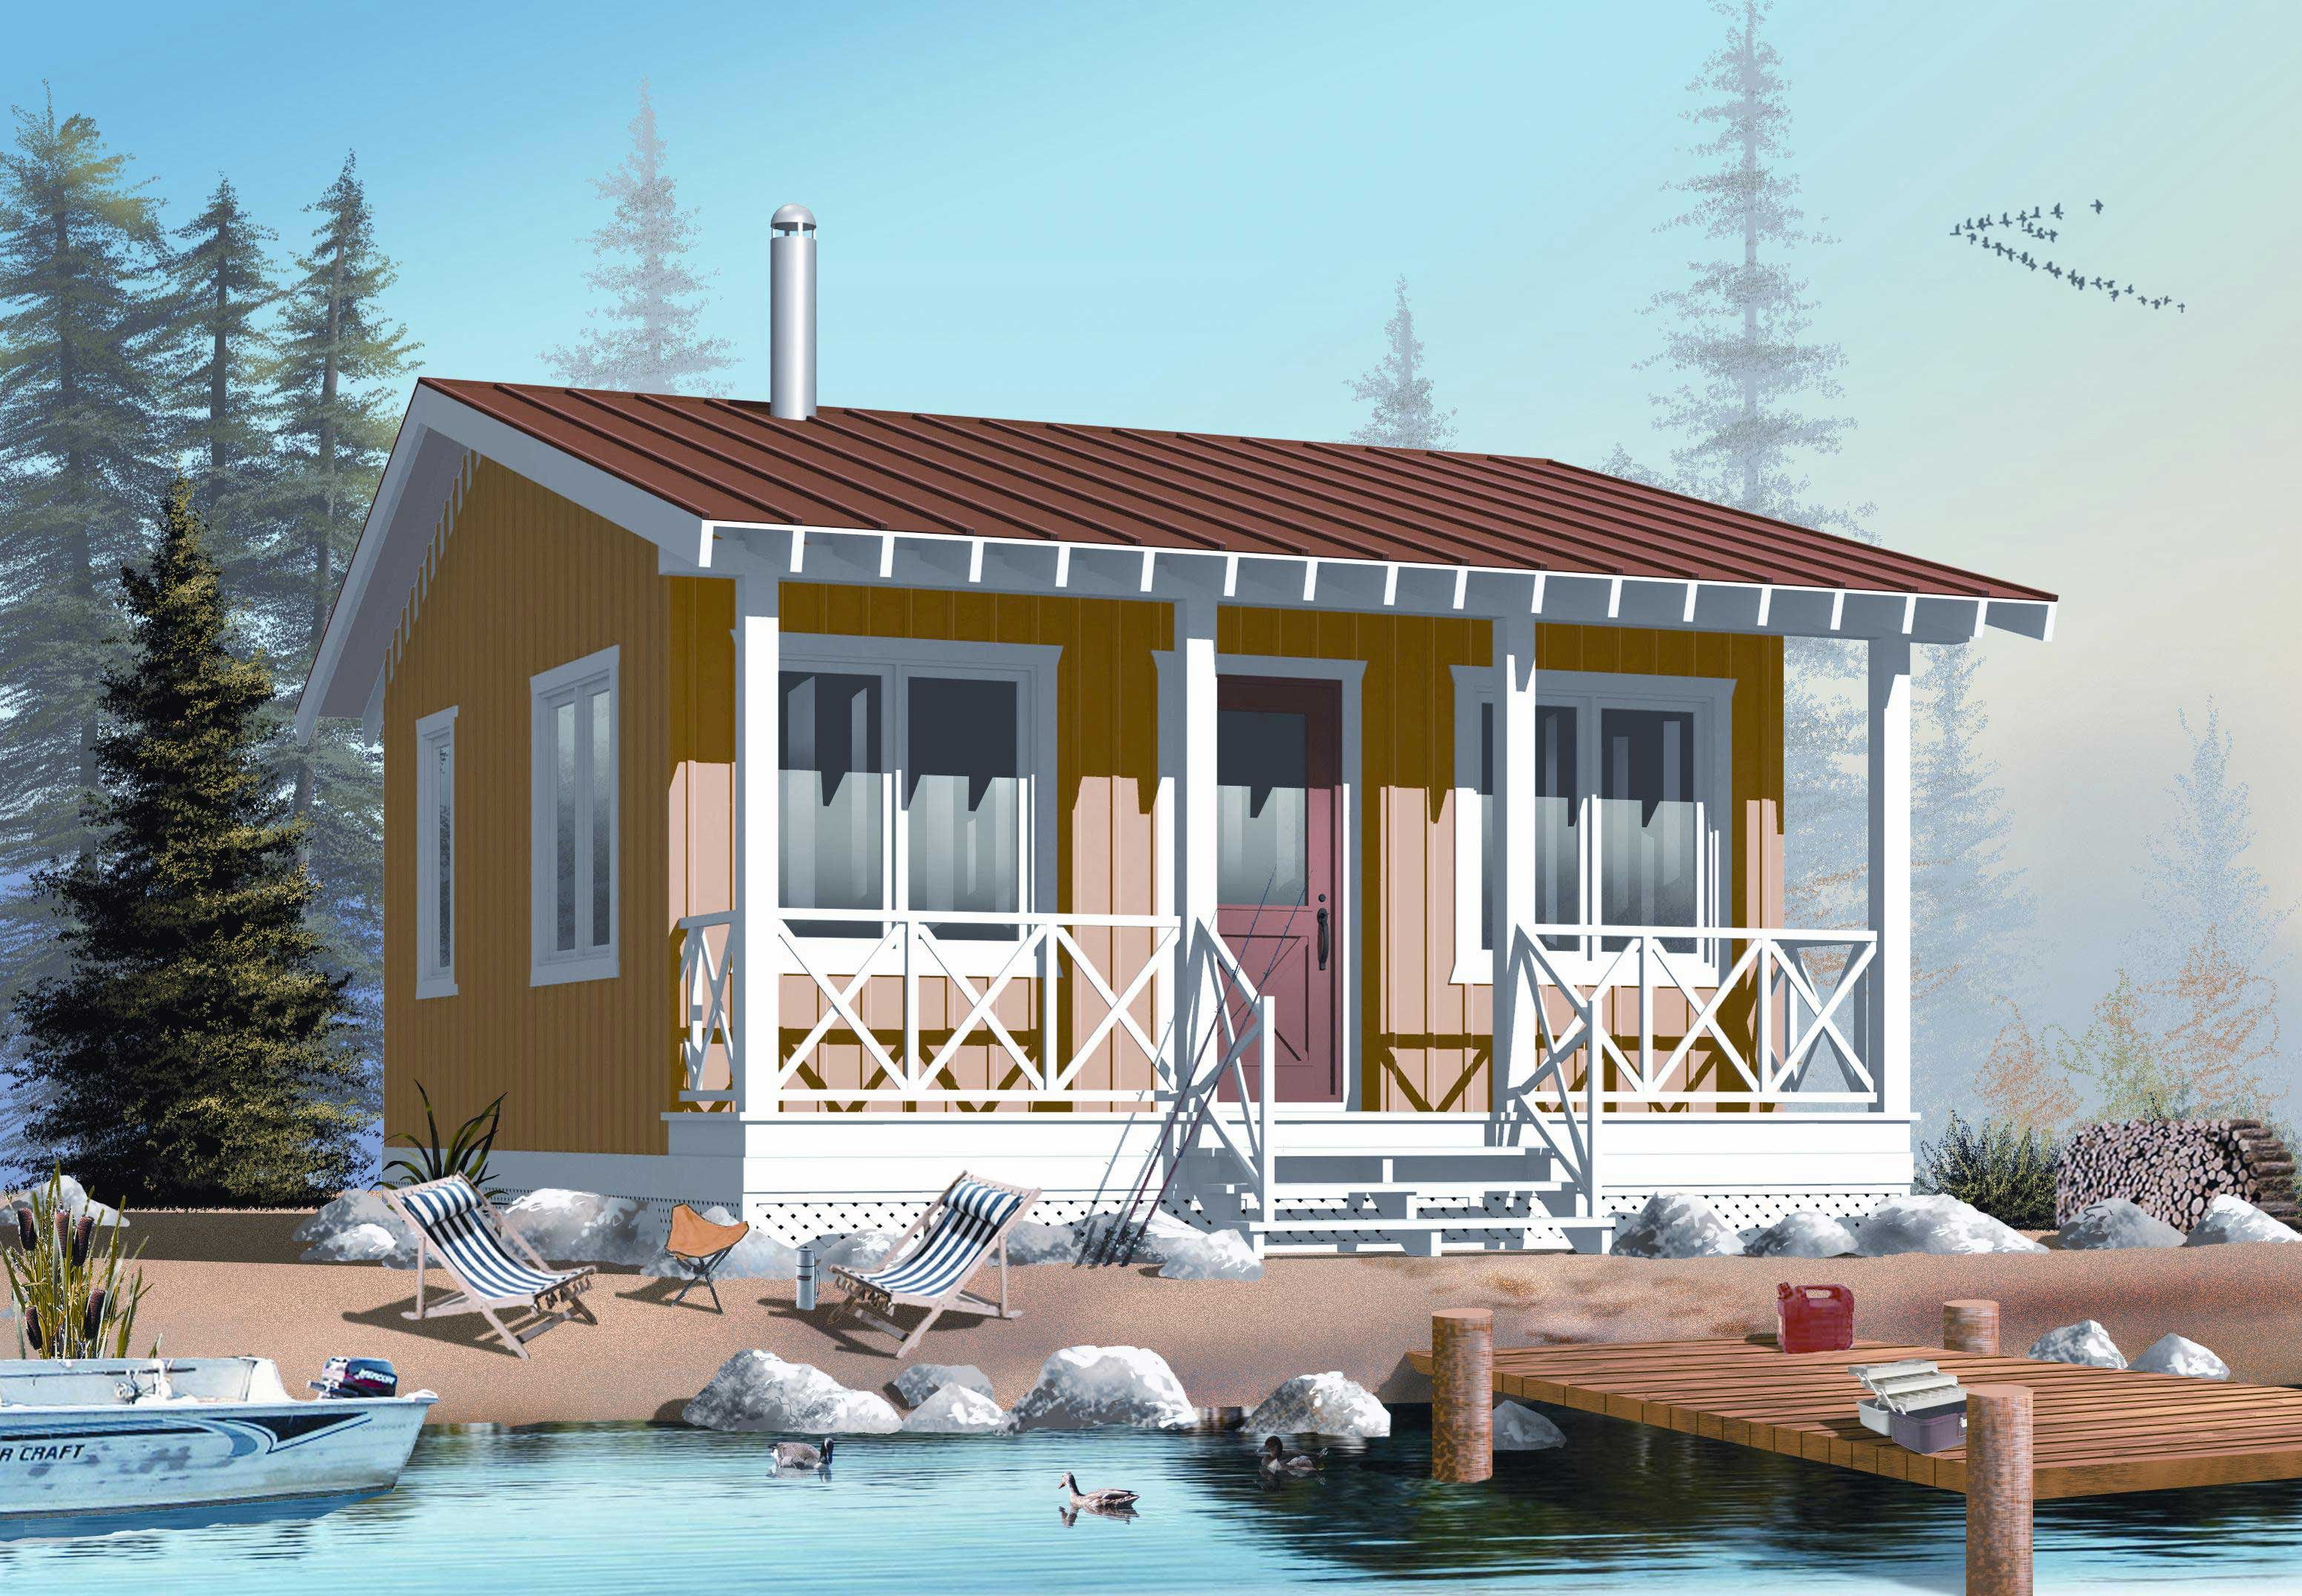 Small House Plan / Tiny Home 1 Bedrm, 1 Bath 400 Sq Ft 1261022 - Small House Plans For Sale Small House Bliss